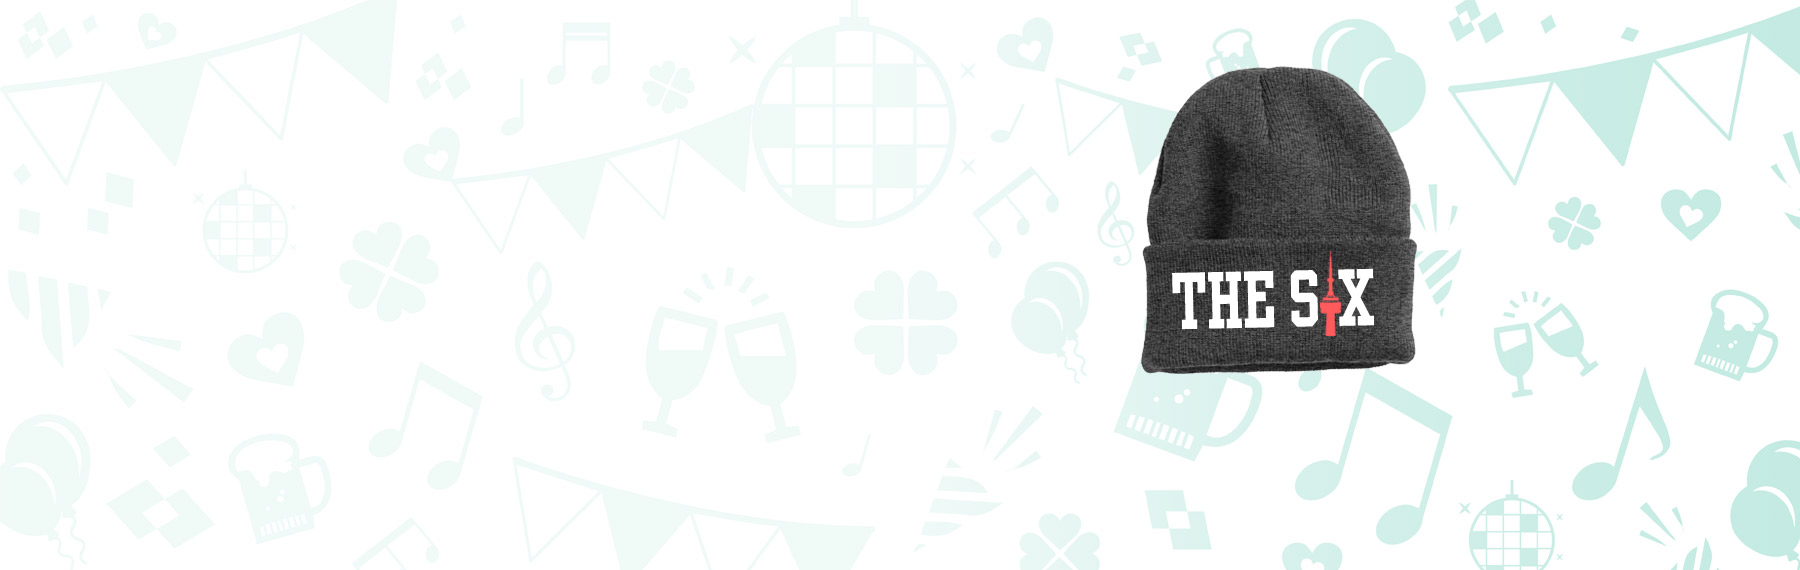 76af9c5ee231a0 Design Custom Toques Online in Canada | T-Shirt Elephant